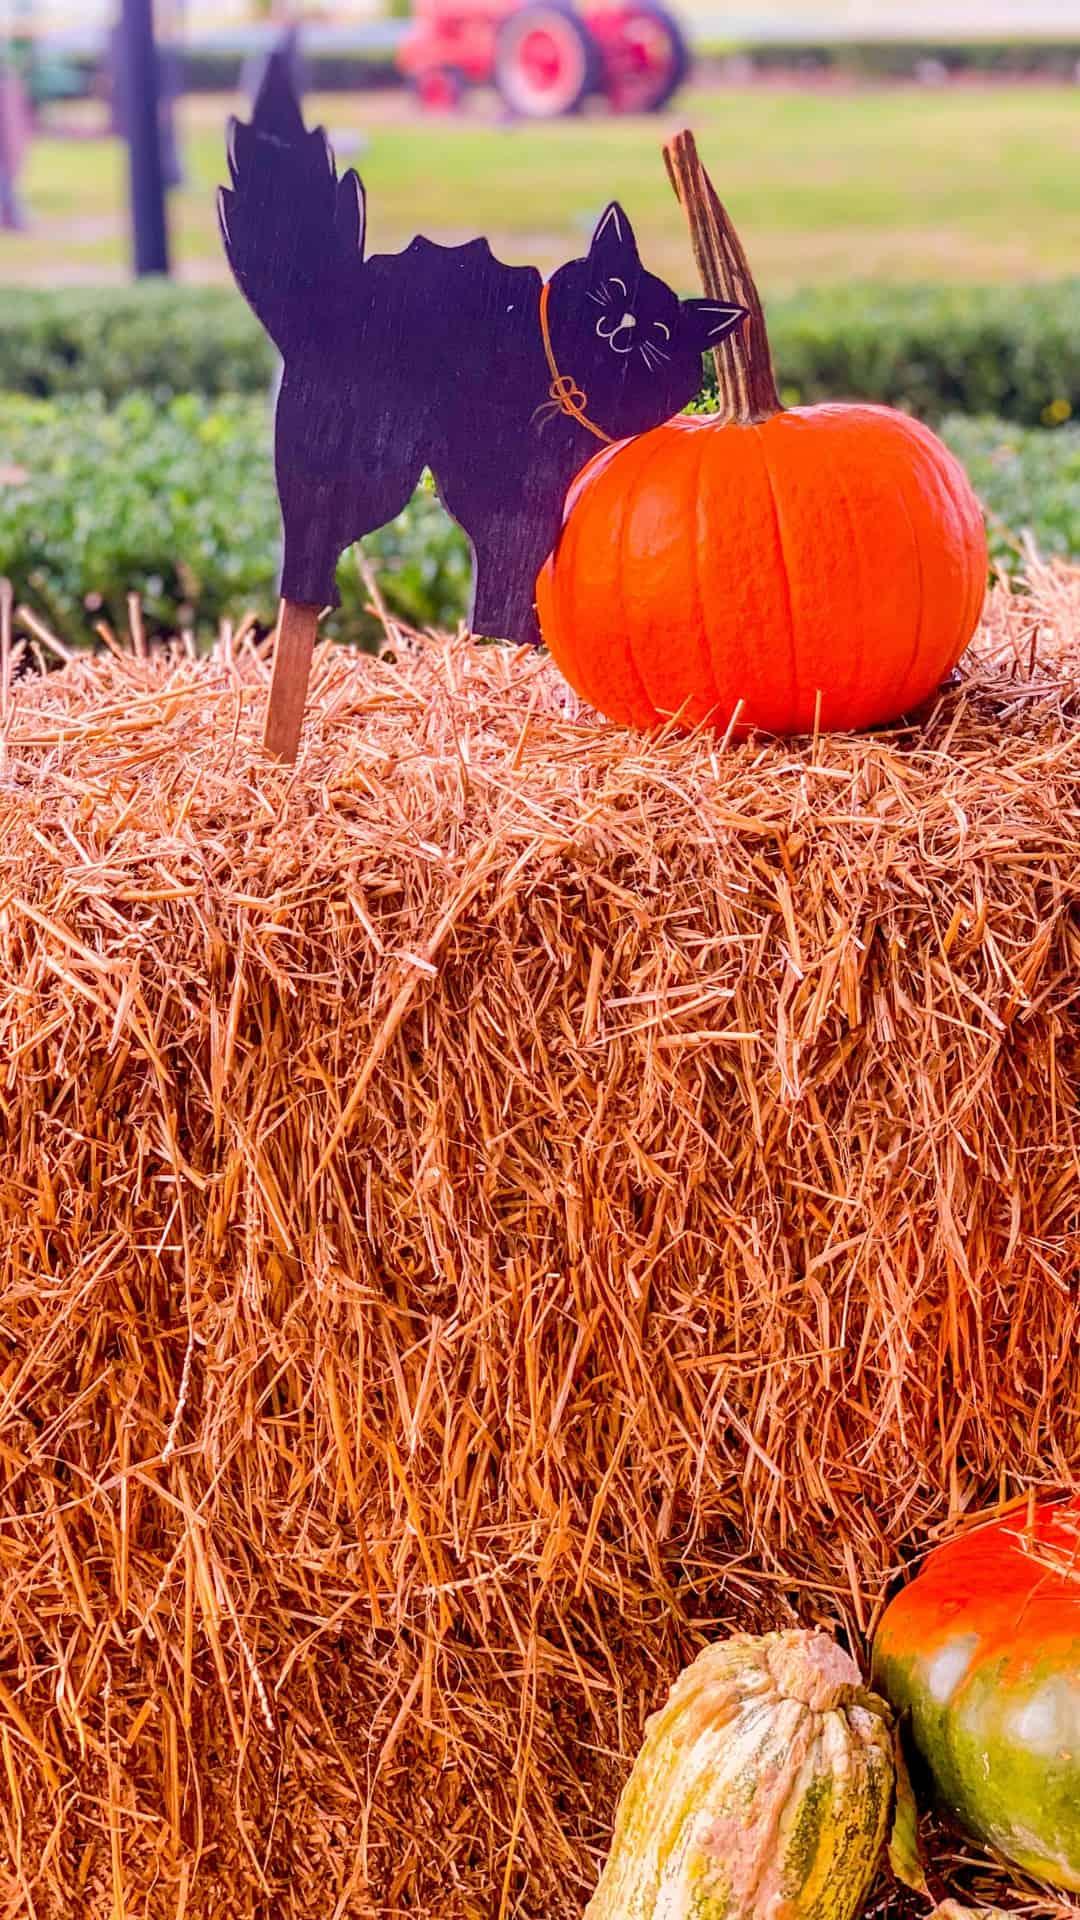 Autumn Wallpaper iPhone Aesthetic Bales of Hay